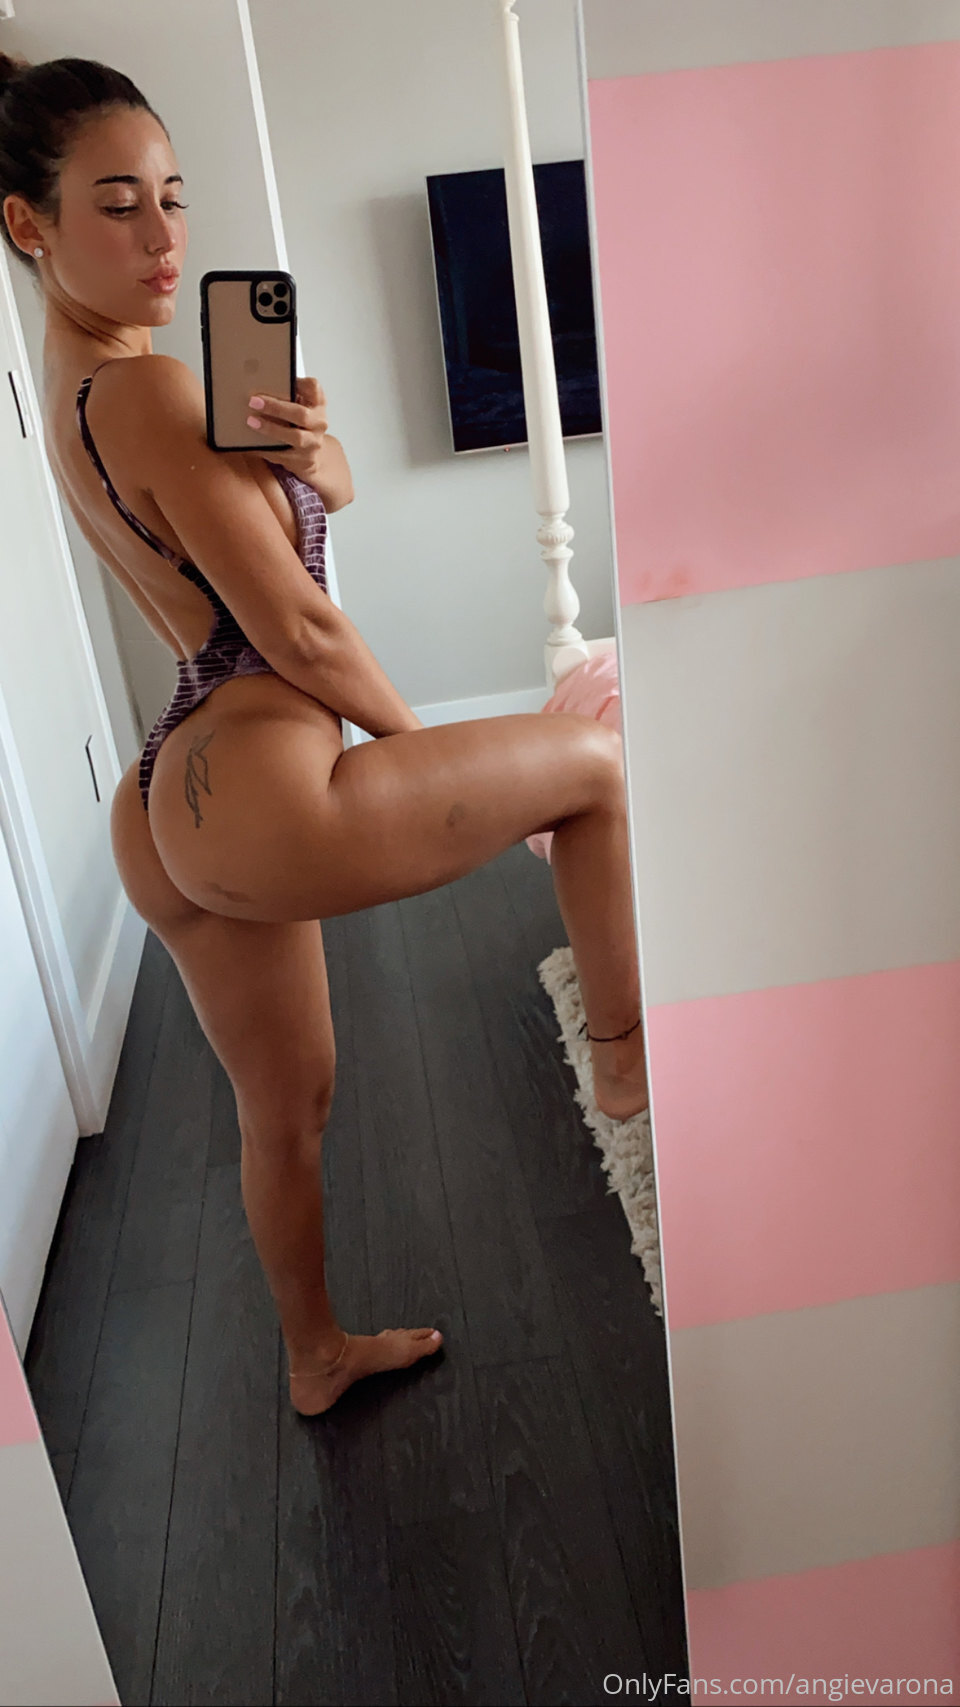 Angie Varona Onlyfans 0171